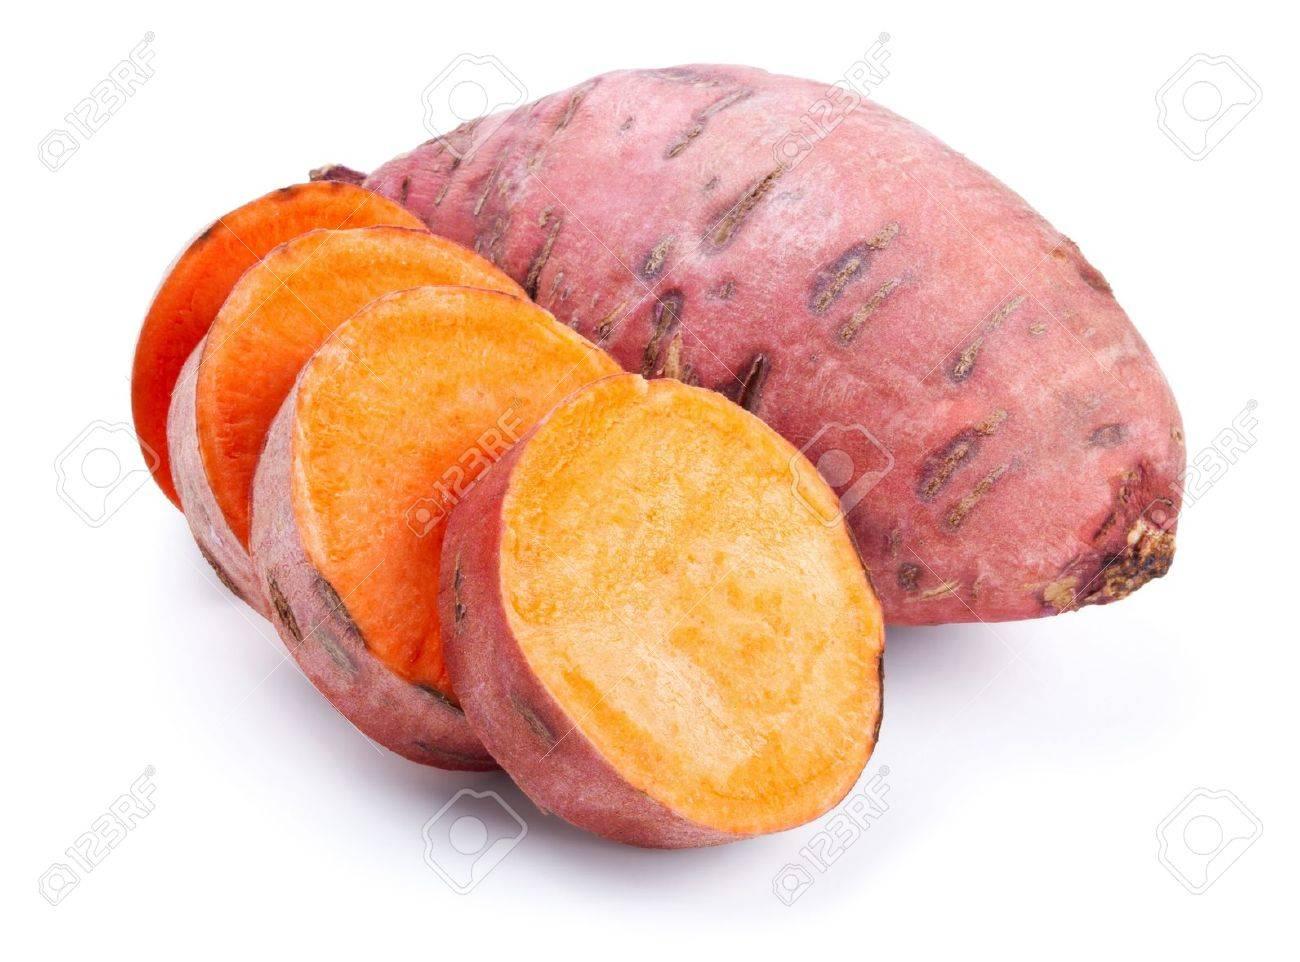 Sweet potato with slices isolated on white background Stock Photo - 13127029